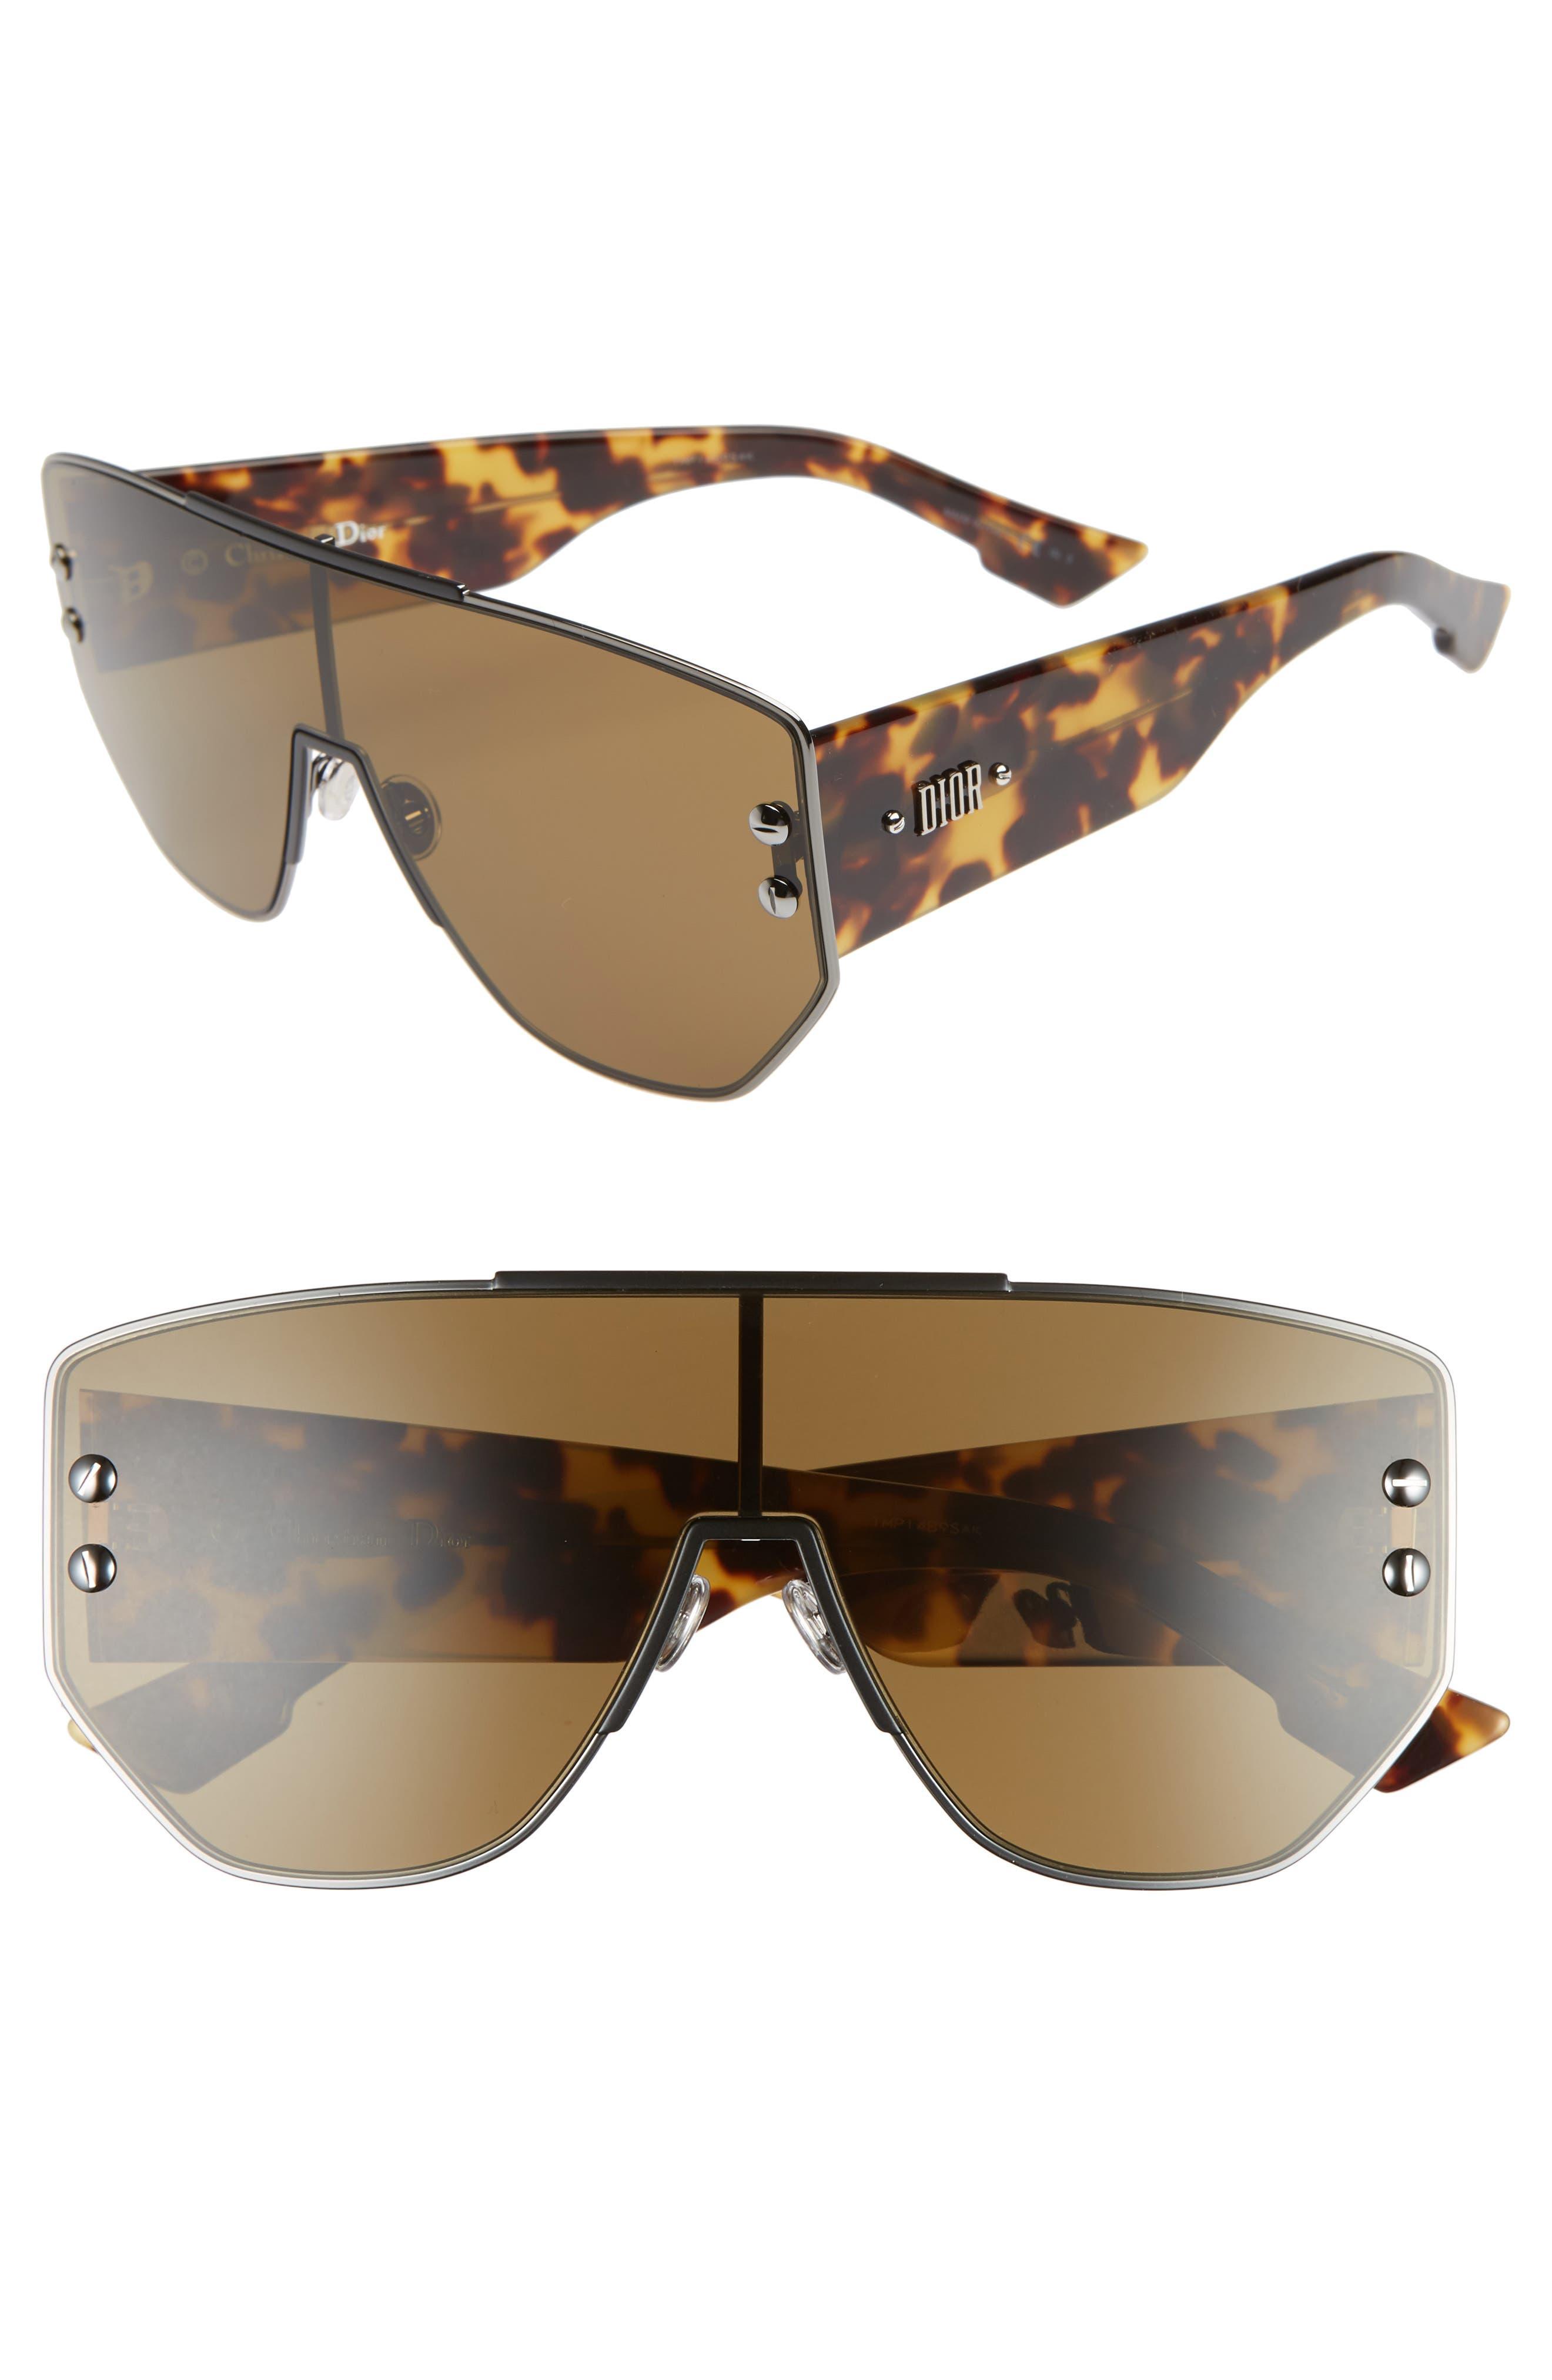 72mm Rimless Shield Sunglasses,                             Main thumbnail 1, color,                             DARK RUTHENIUM/ BLACK